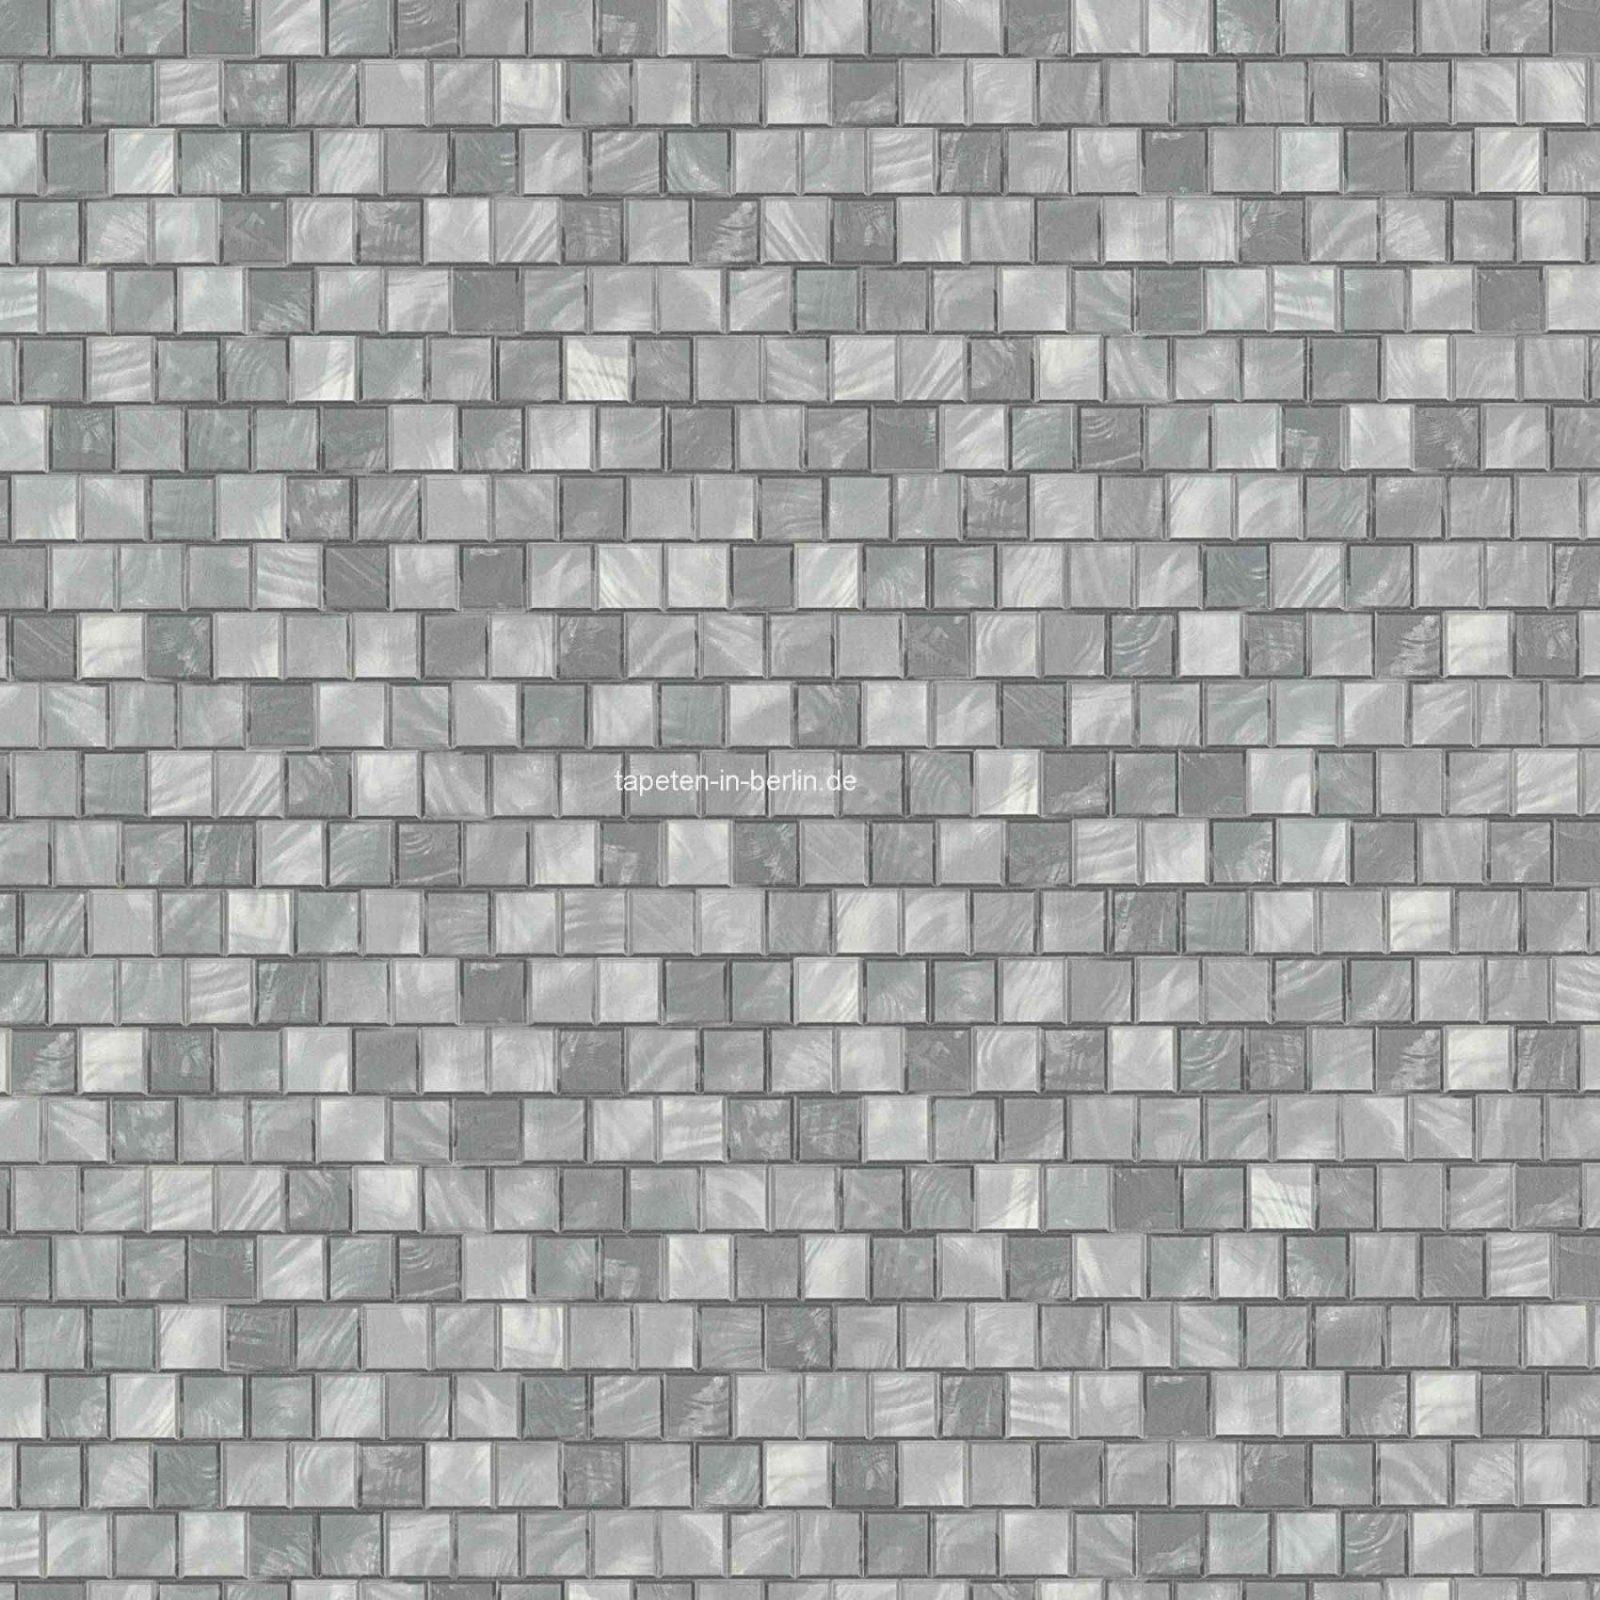 steintapeten in 3d optik grau beige braun wohnzimmer steintapete von steintapeten in 3d optik. Black Bedroom Furniture Sets. Home Design Ideas